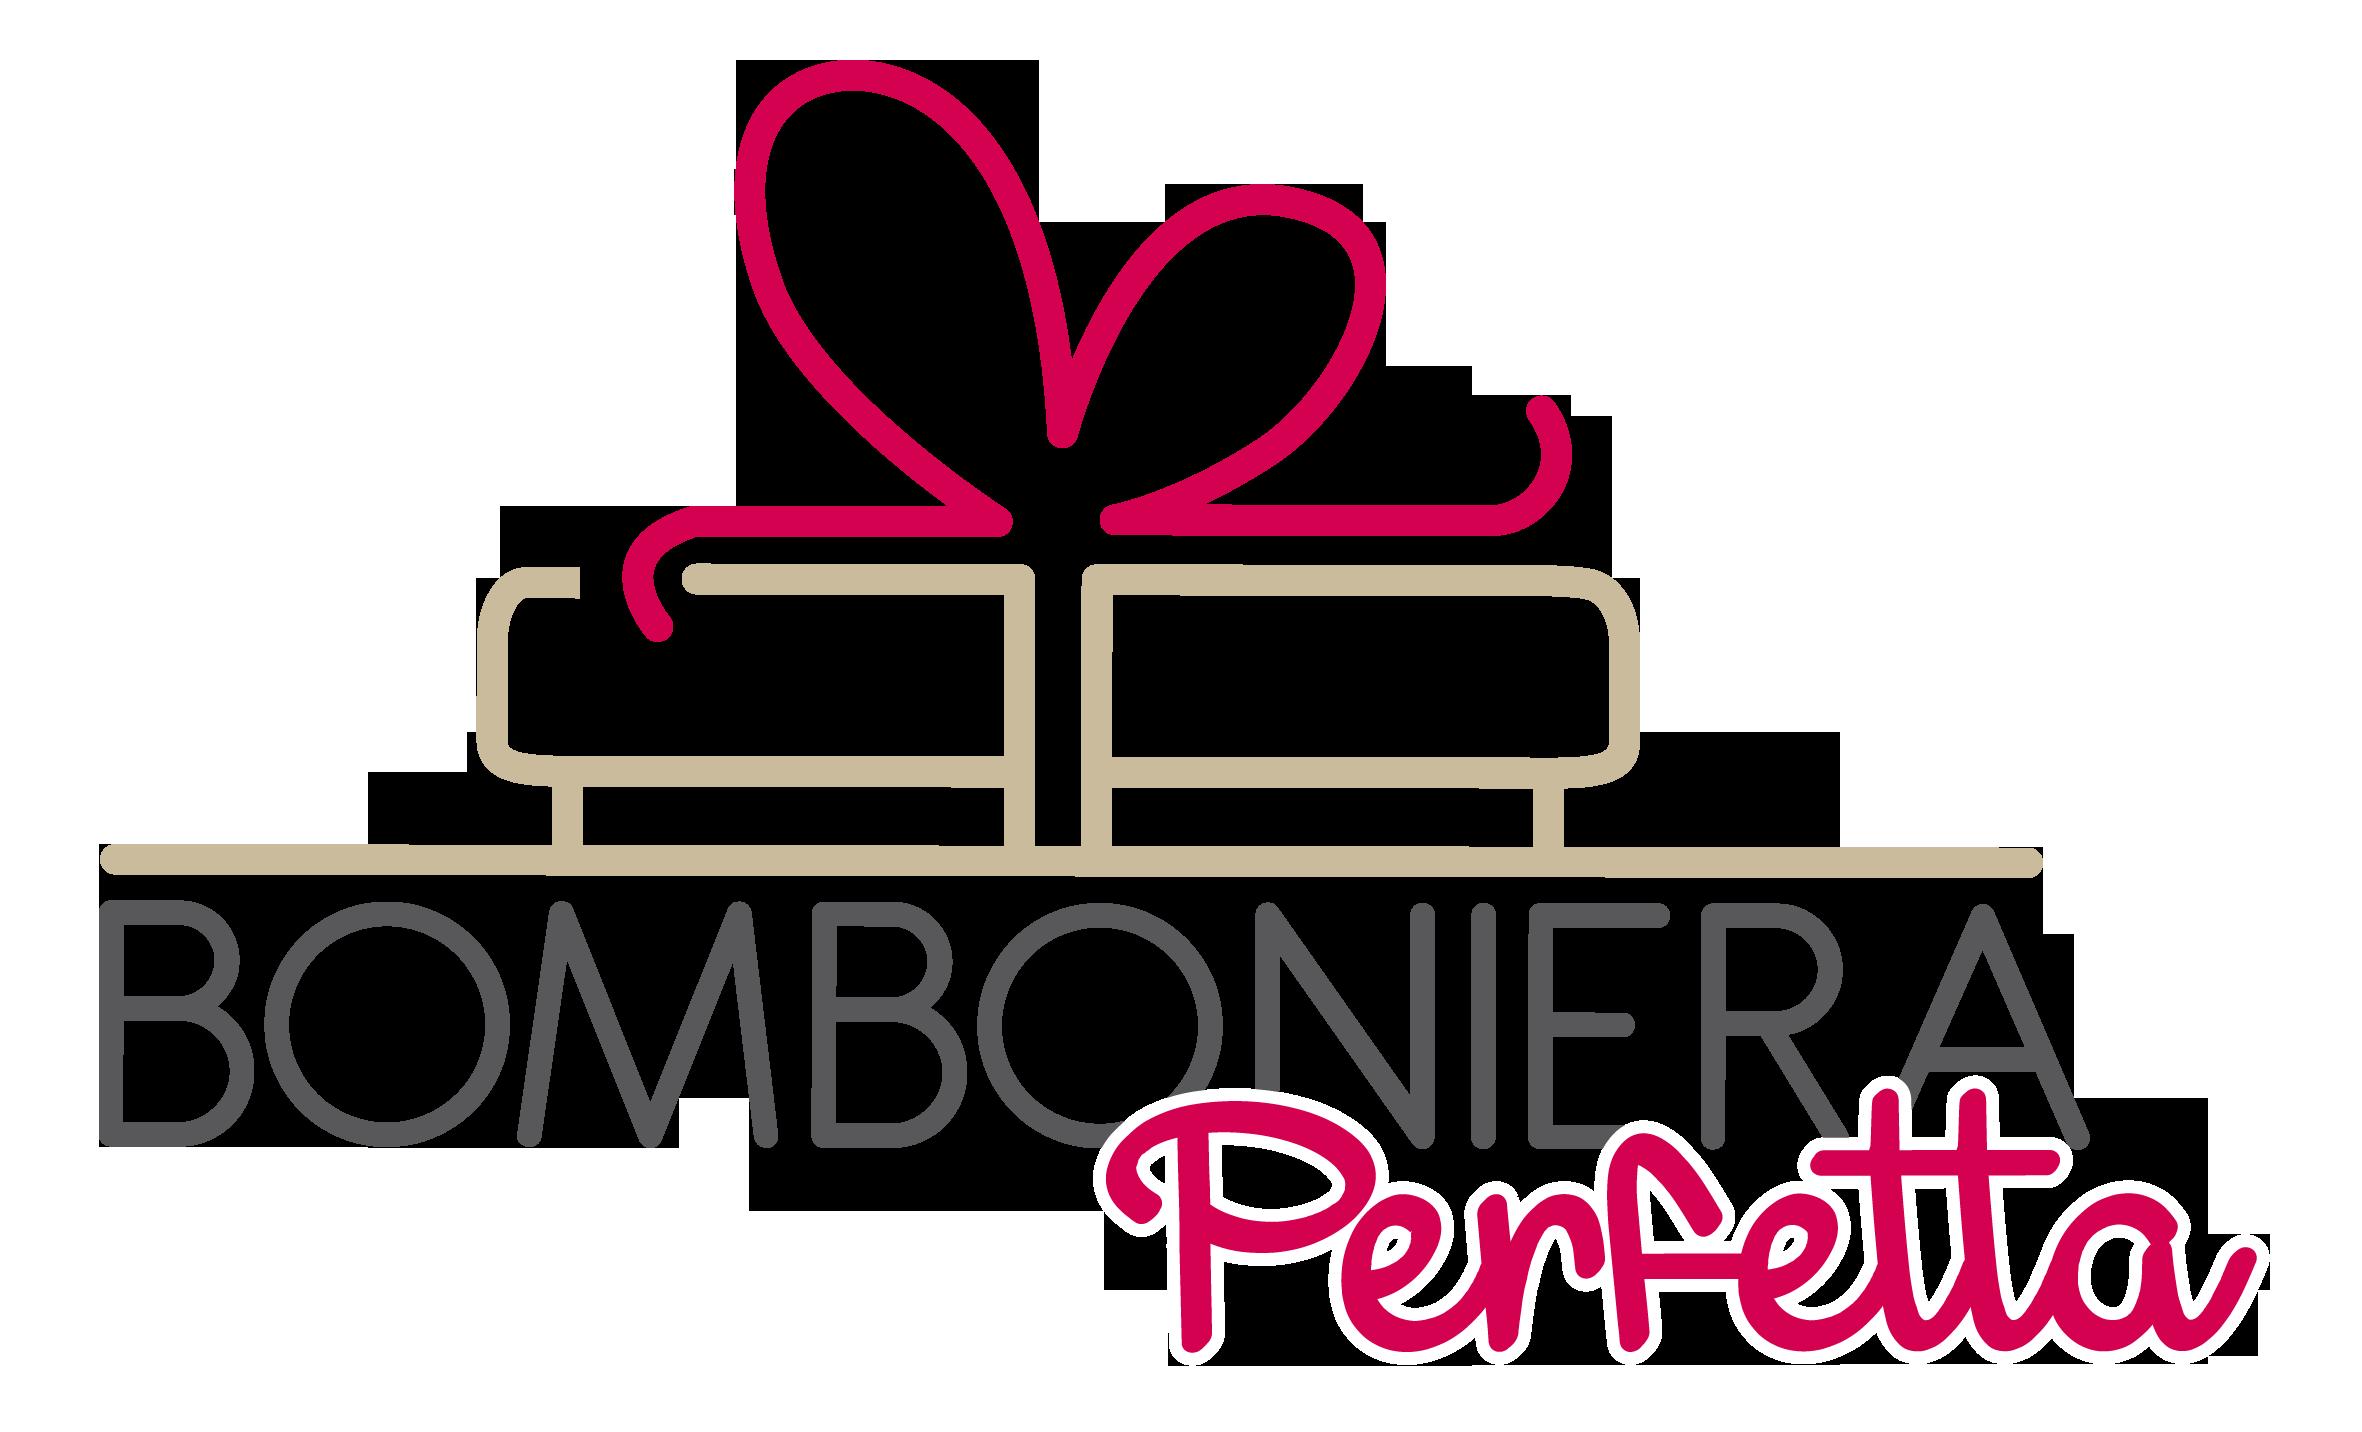 bomboniera-perfetta-vendita-online-bomboniere